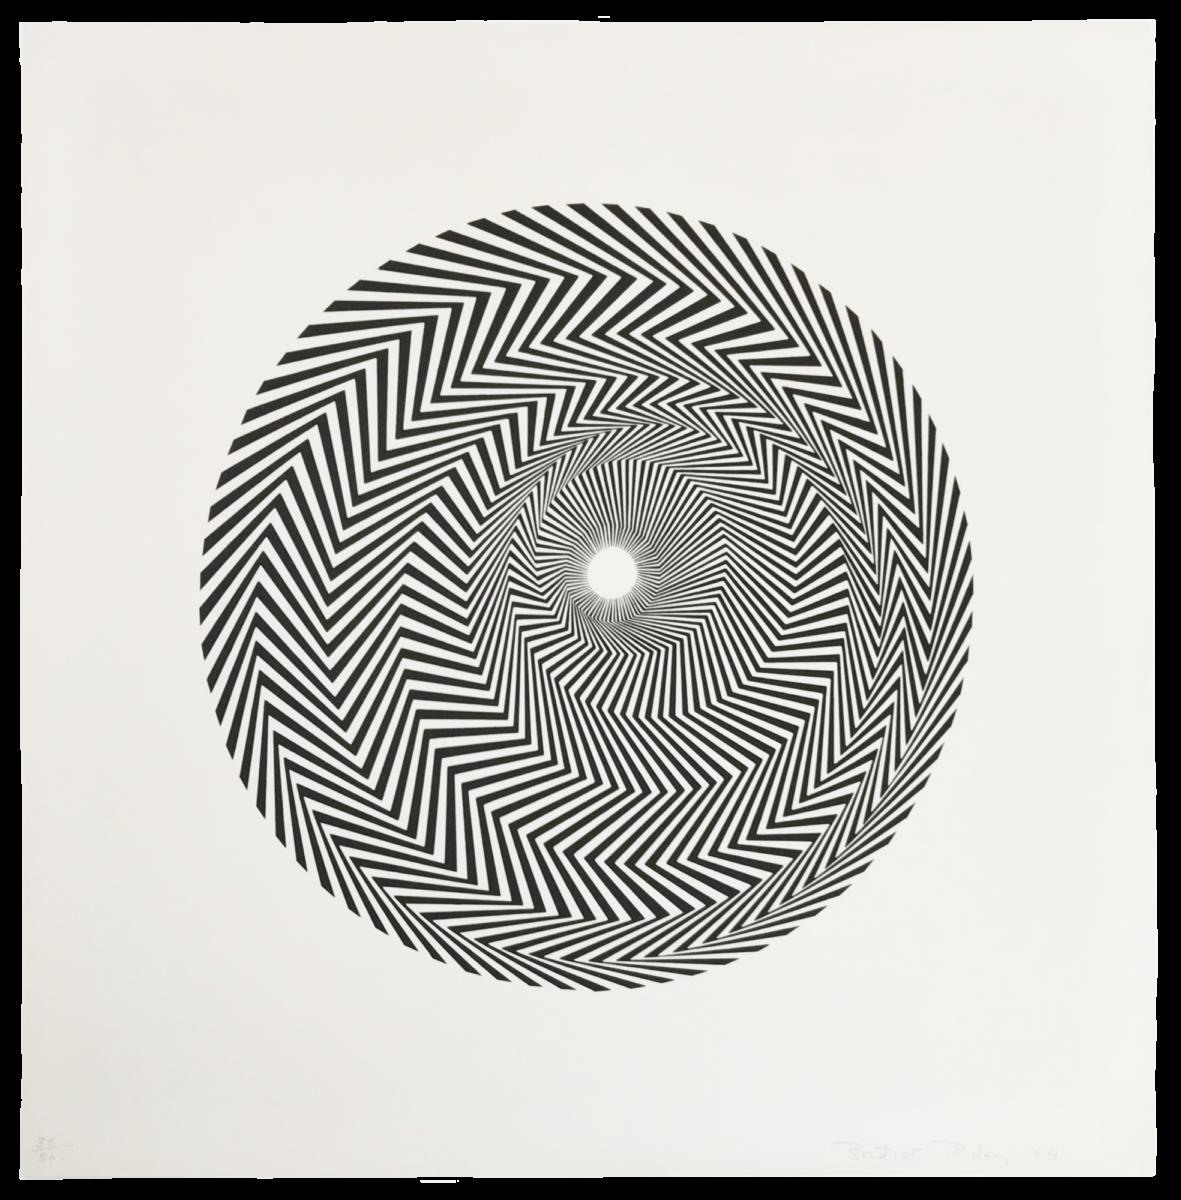 Bridget Riley Untitled [based on Blaze] original black and white screenprint for sale